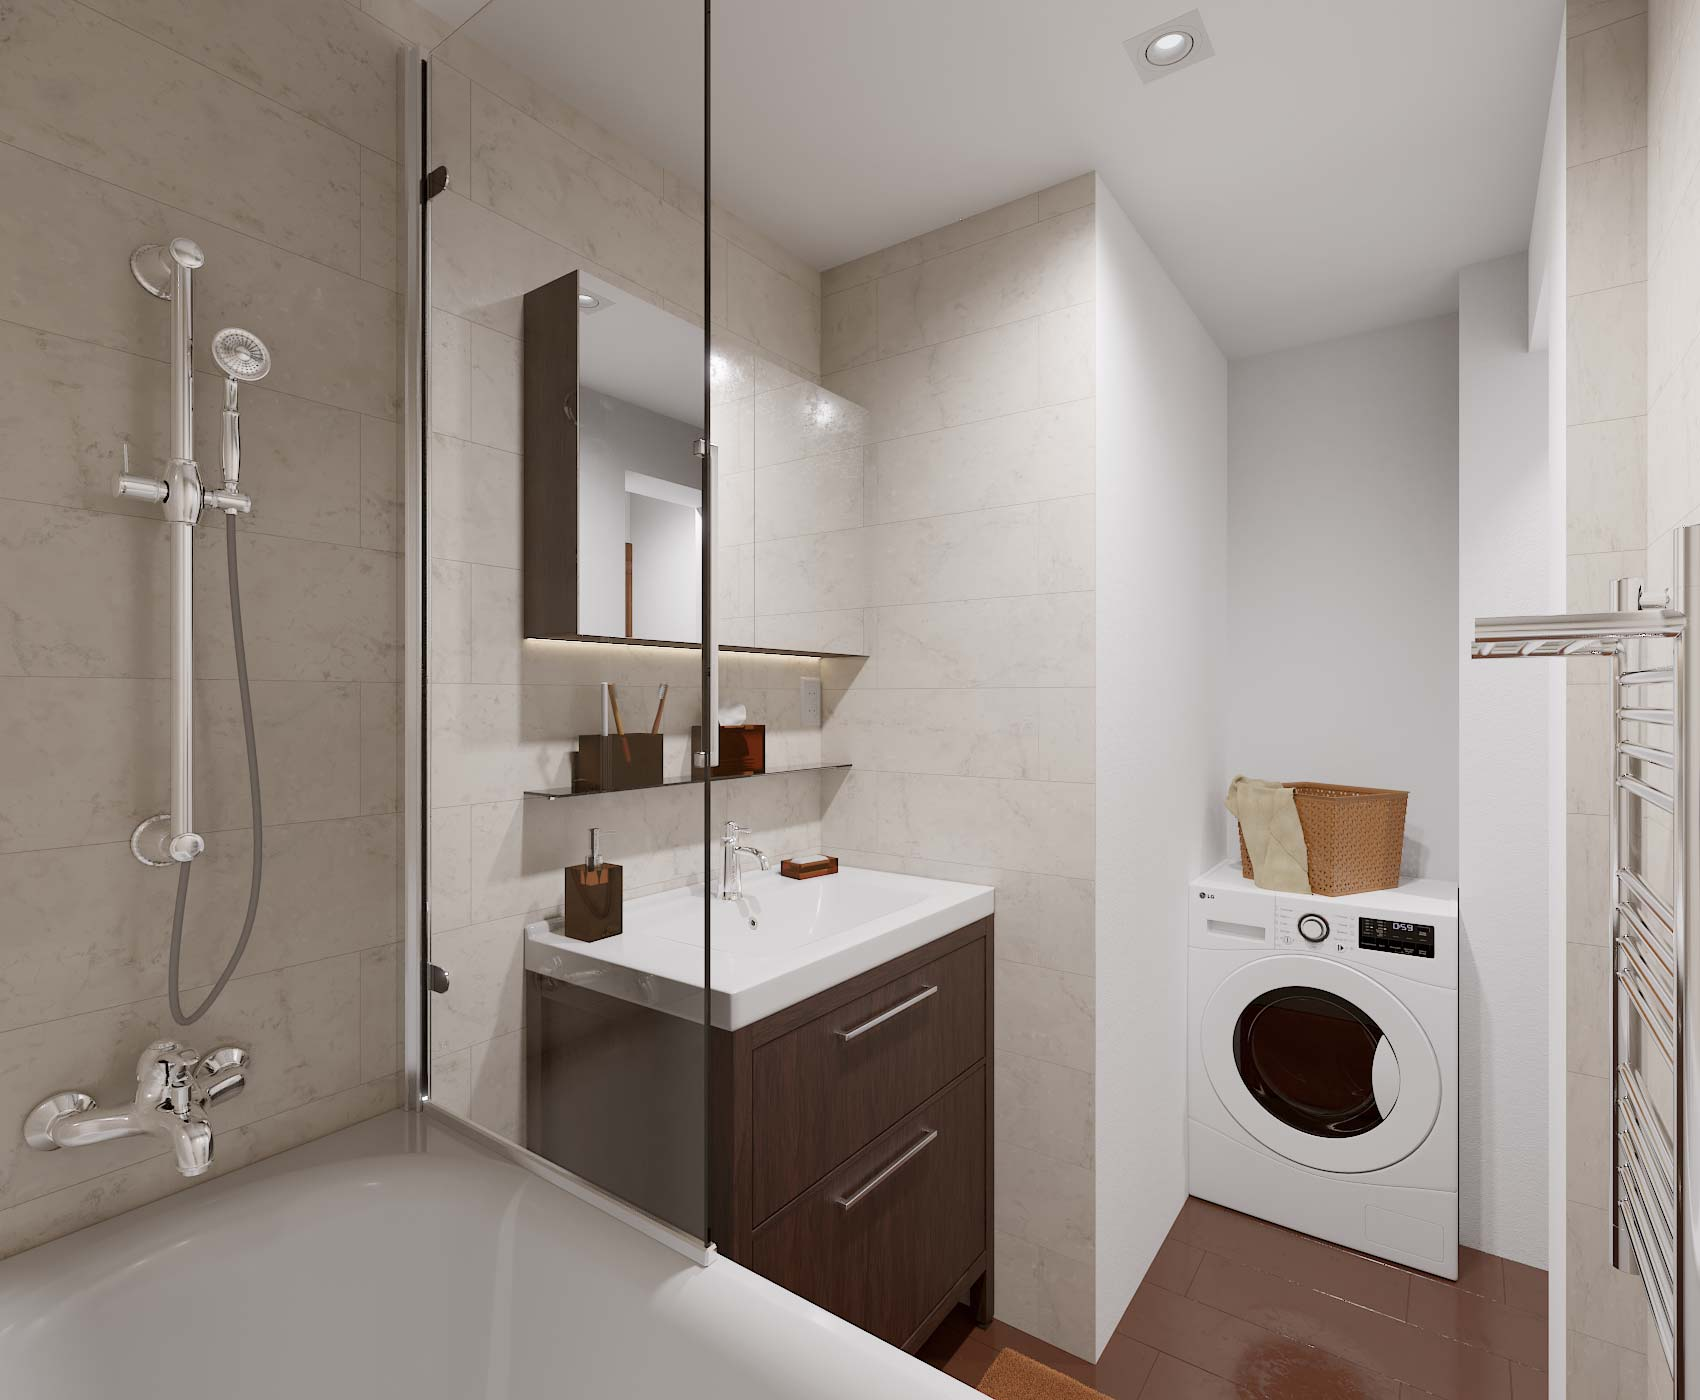 idea3d - vizualizácia kúpeľňa 2